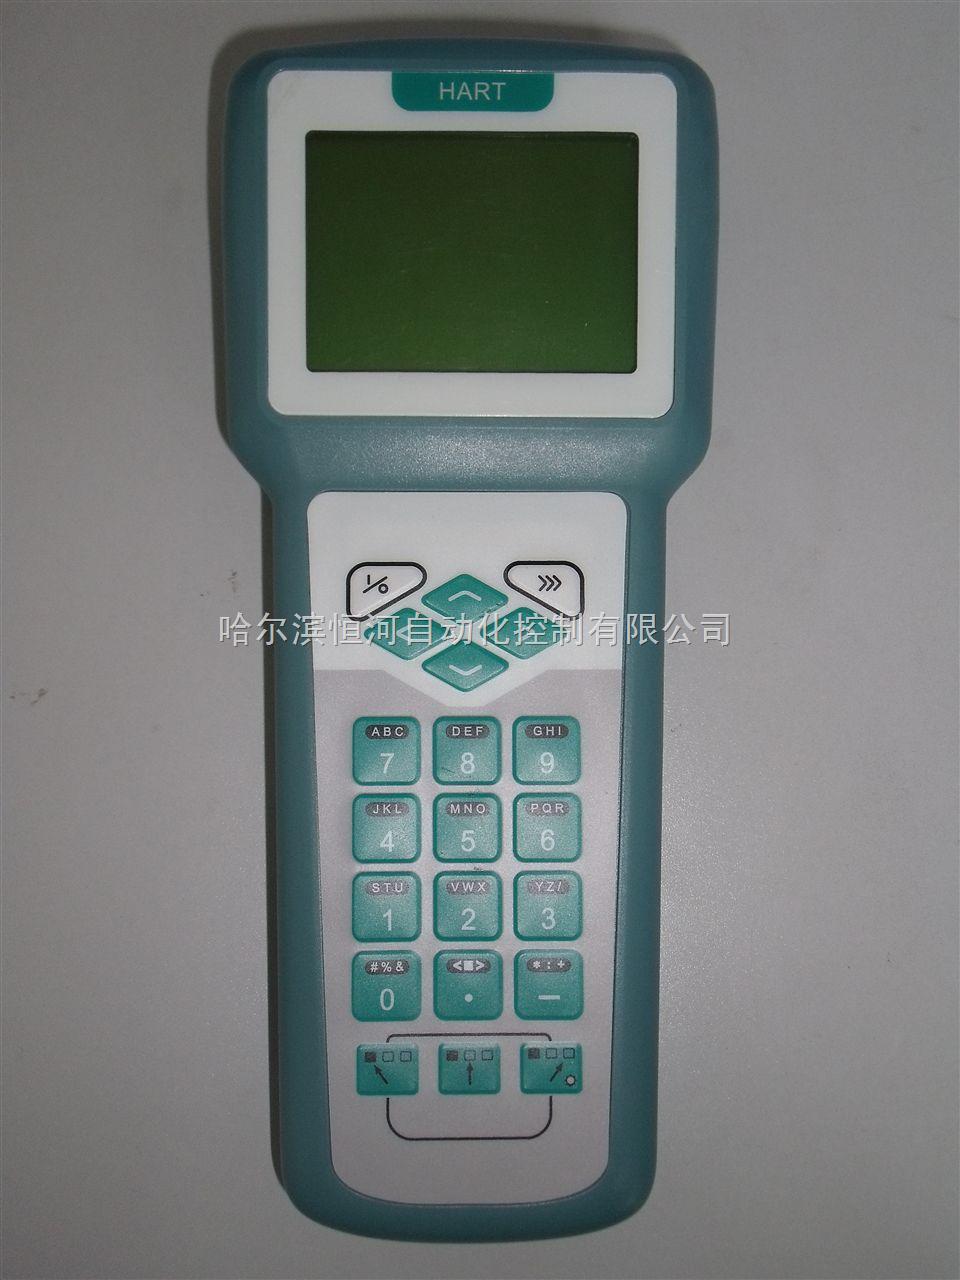 HART375智能手持器、数显手持器